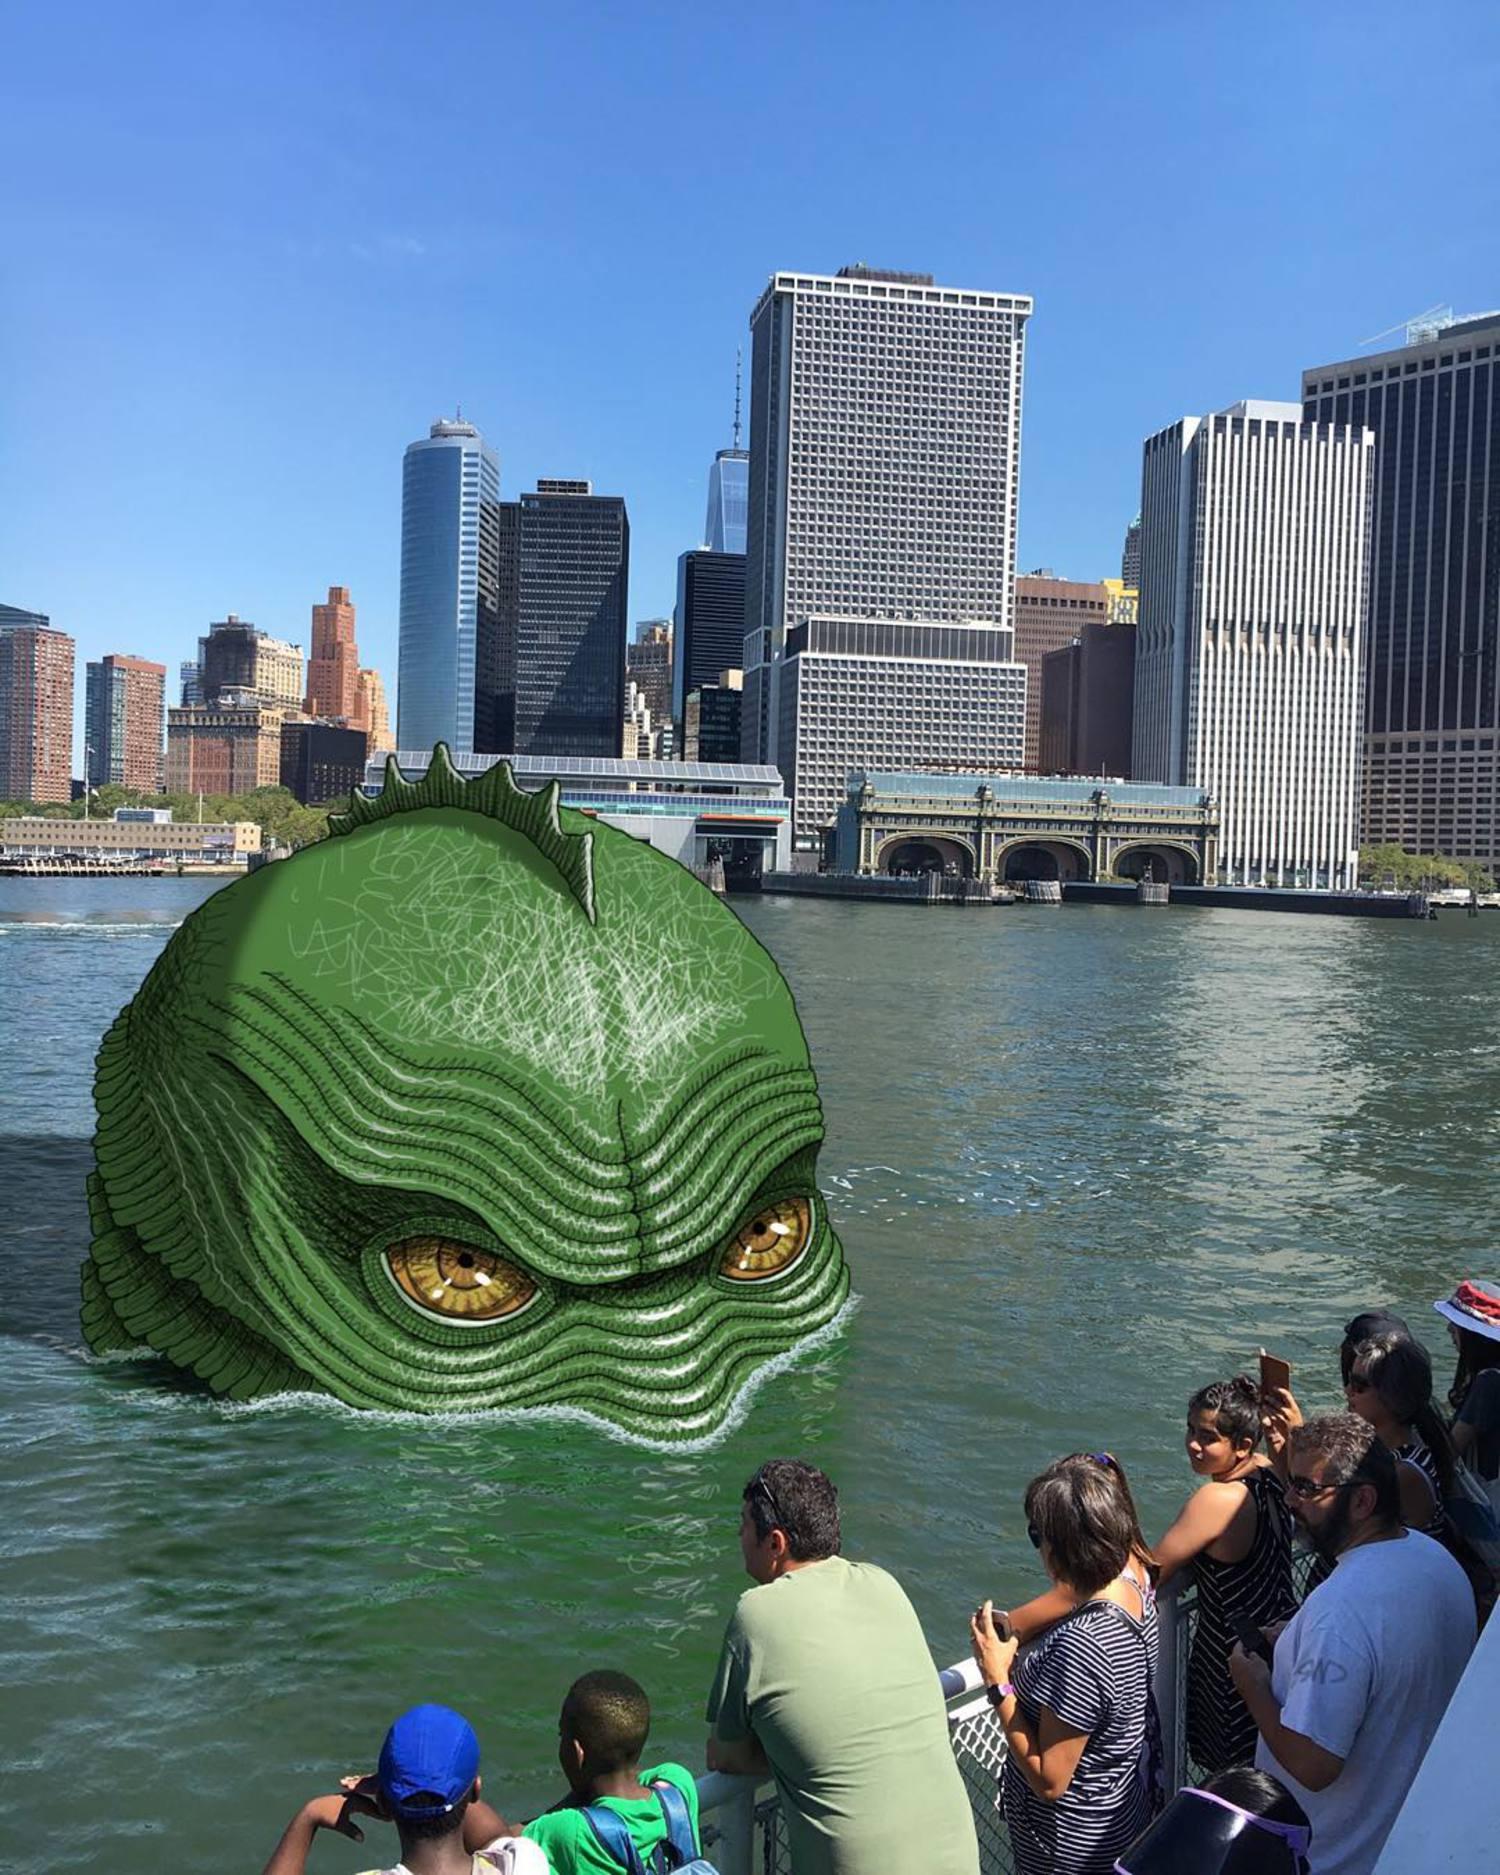 #subwaydoodle #subway #doodle #swd #nyc #governorsislandferry #creaturefromtheblacklagoon